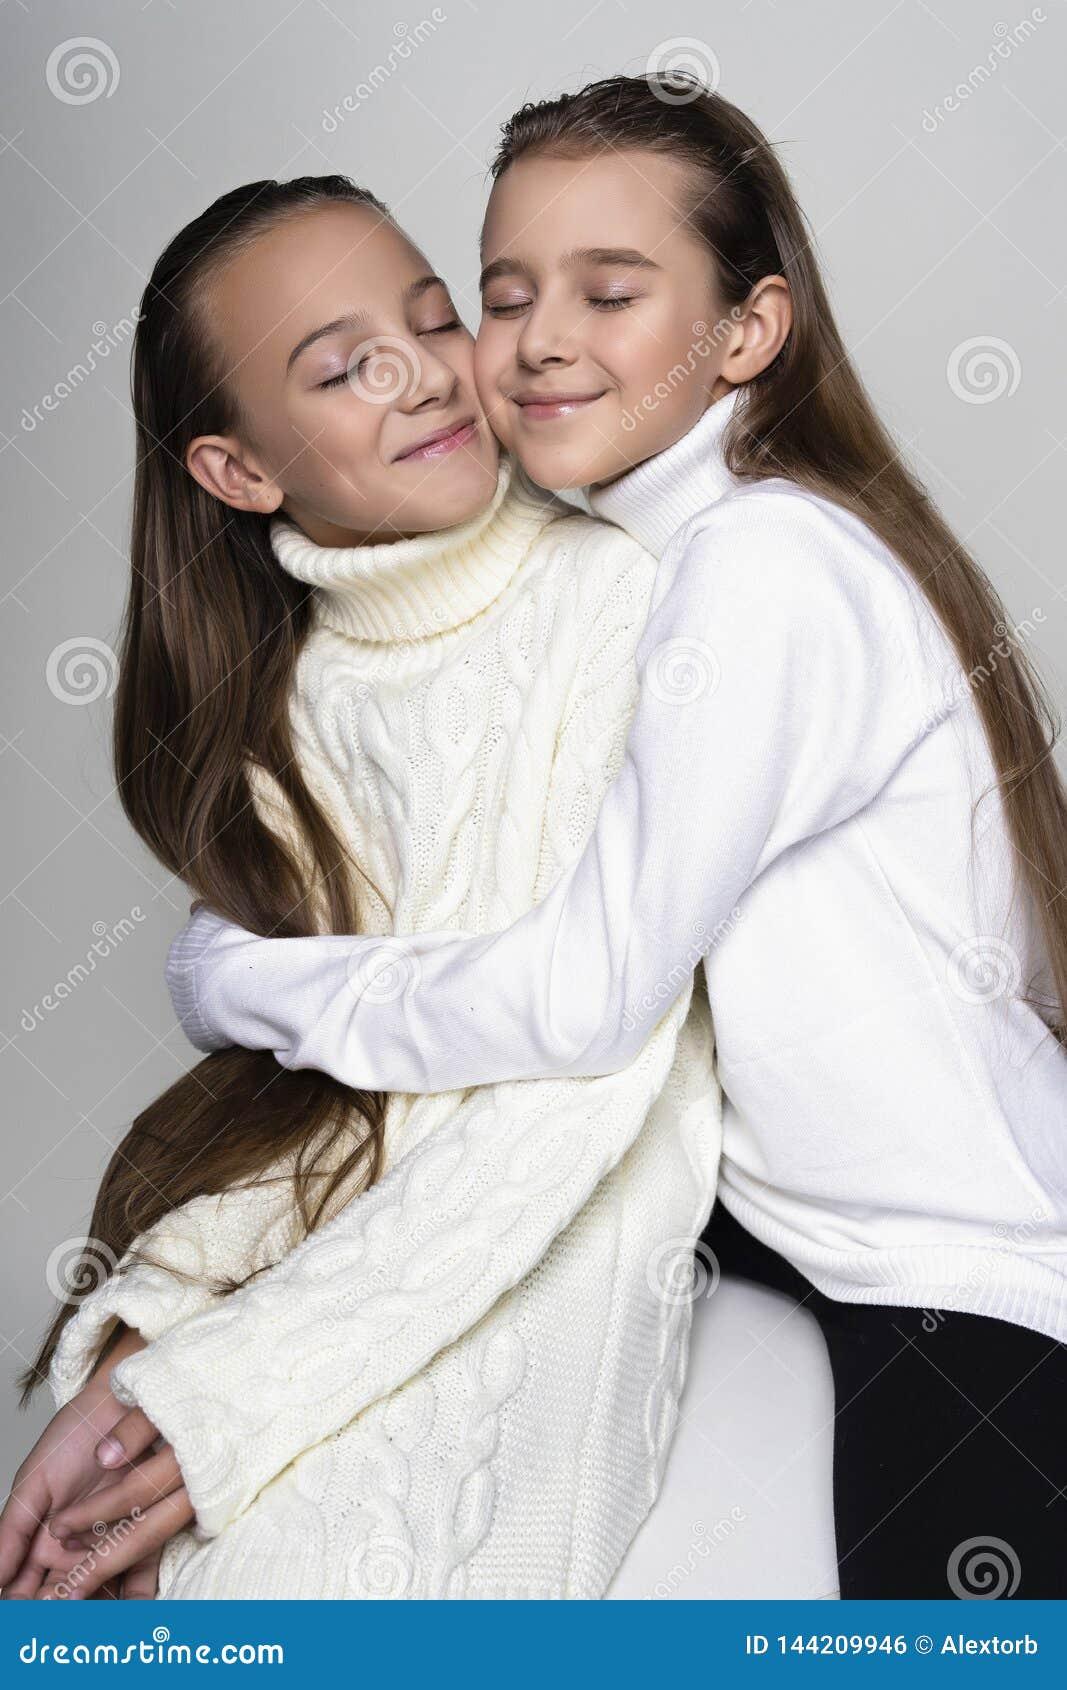 Two cute teenage girlfriends schoolgirls wearing white turtleneck sweaters, smiling sit, hugging each other in a friendly way.